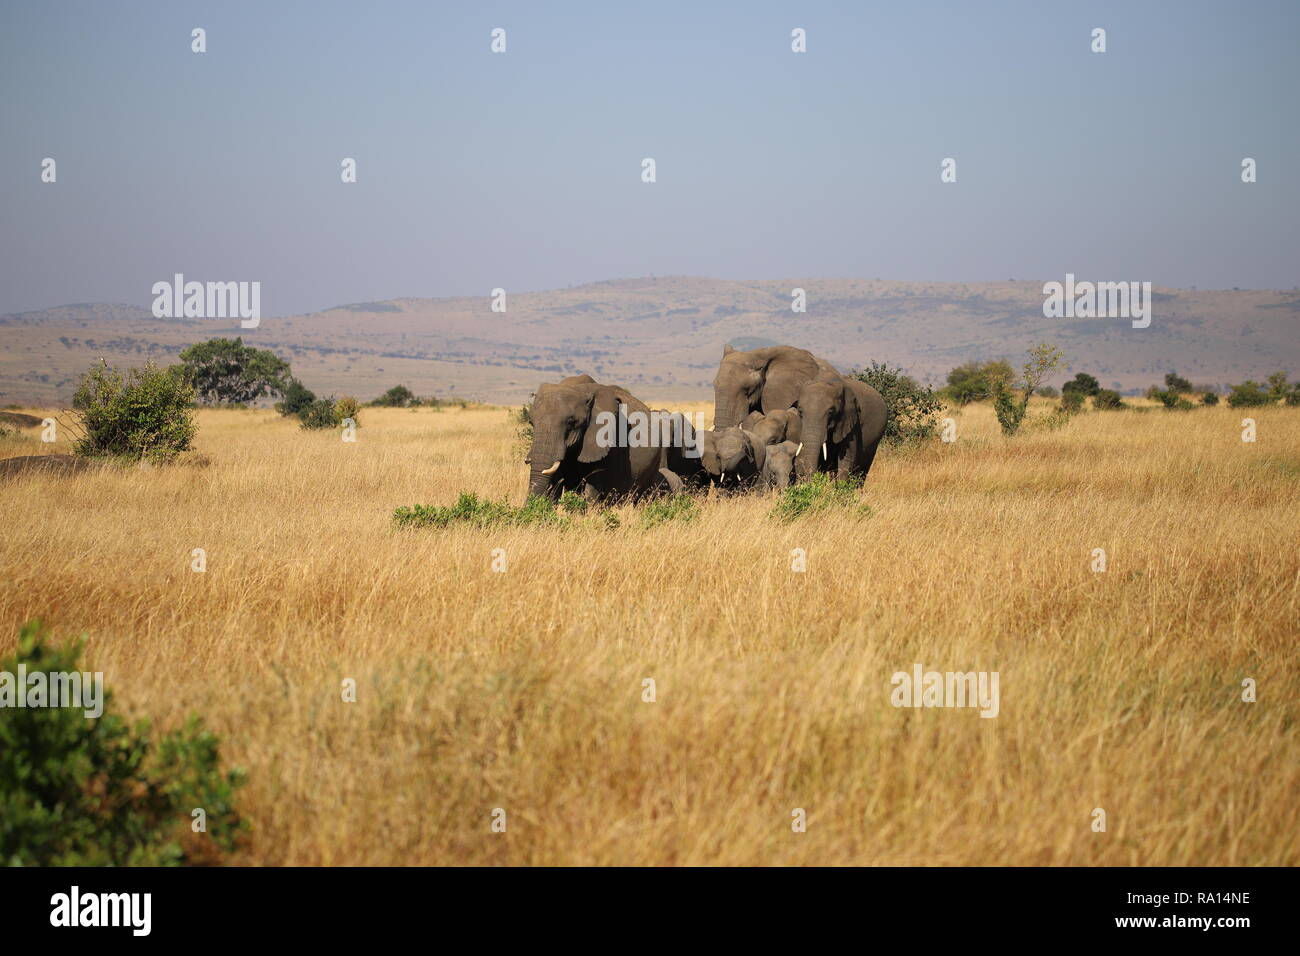 Group of African bush elephants in the Maasai Mara in Kenya - Stock Image